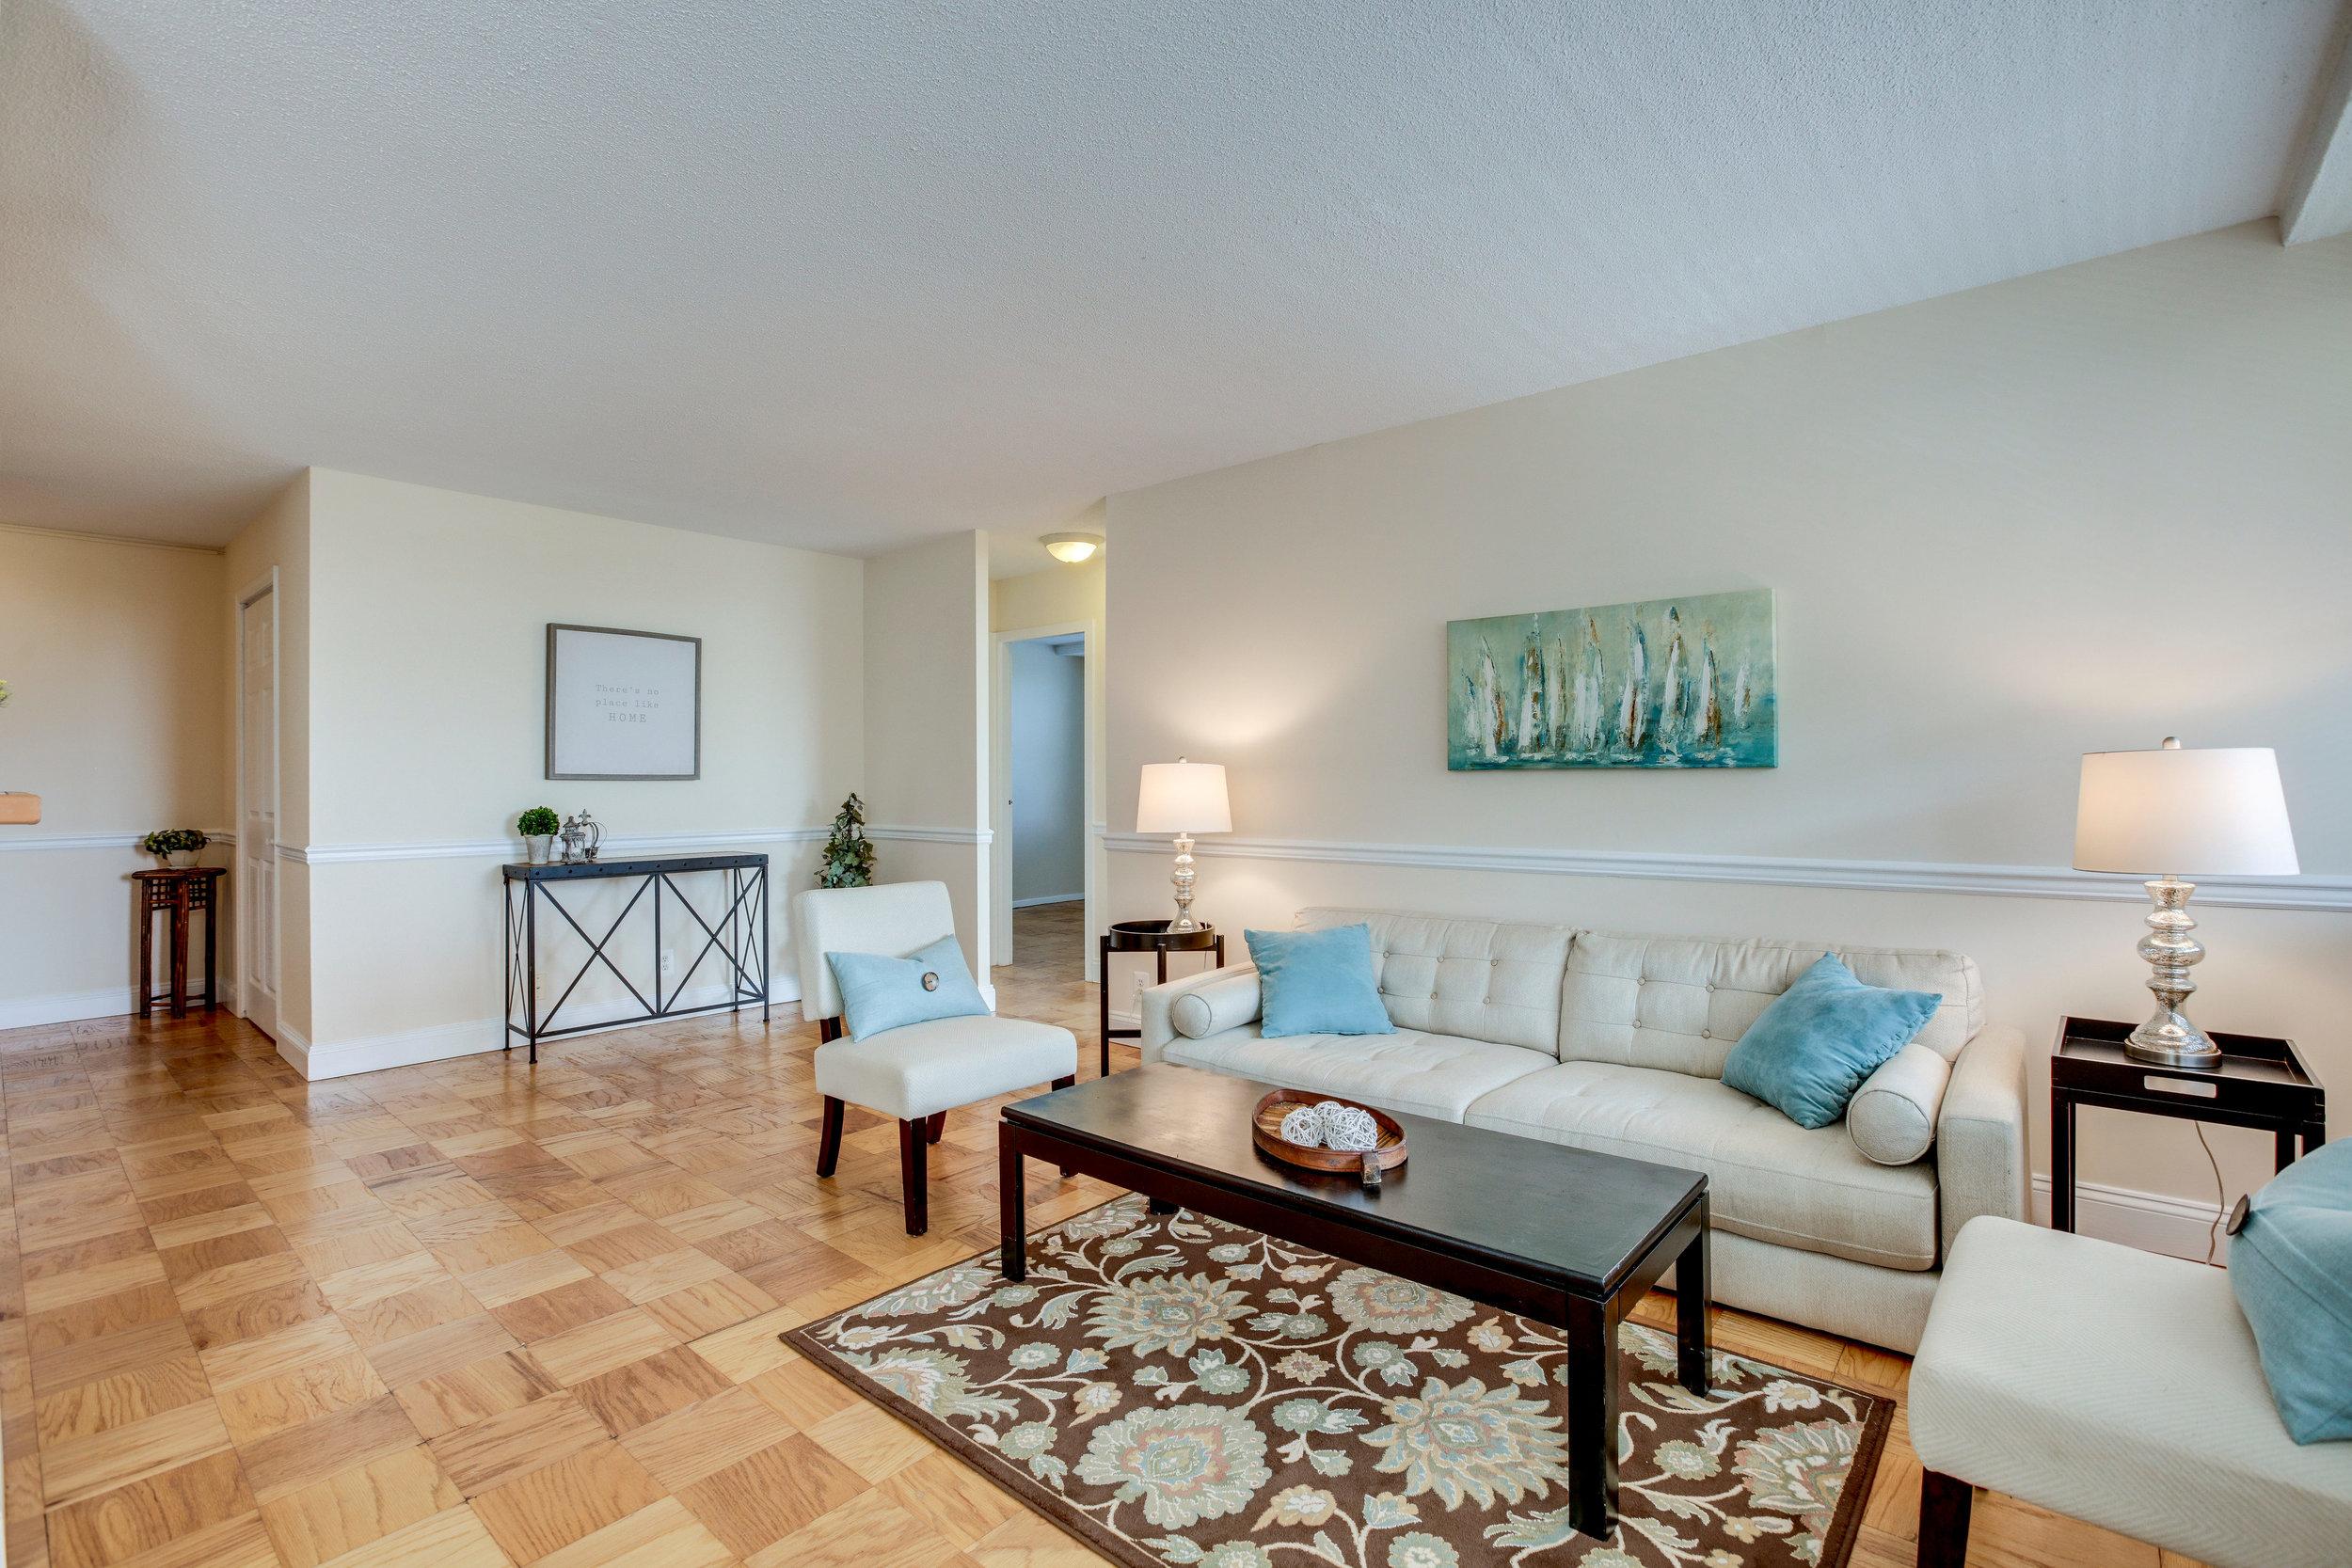 2030 N Adams St 1002 Arlington-print-019-89-Living Room-4200x2800-300dpi.jpg